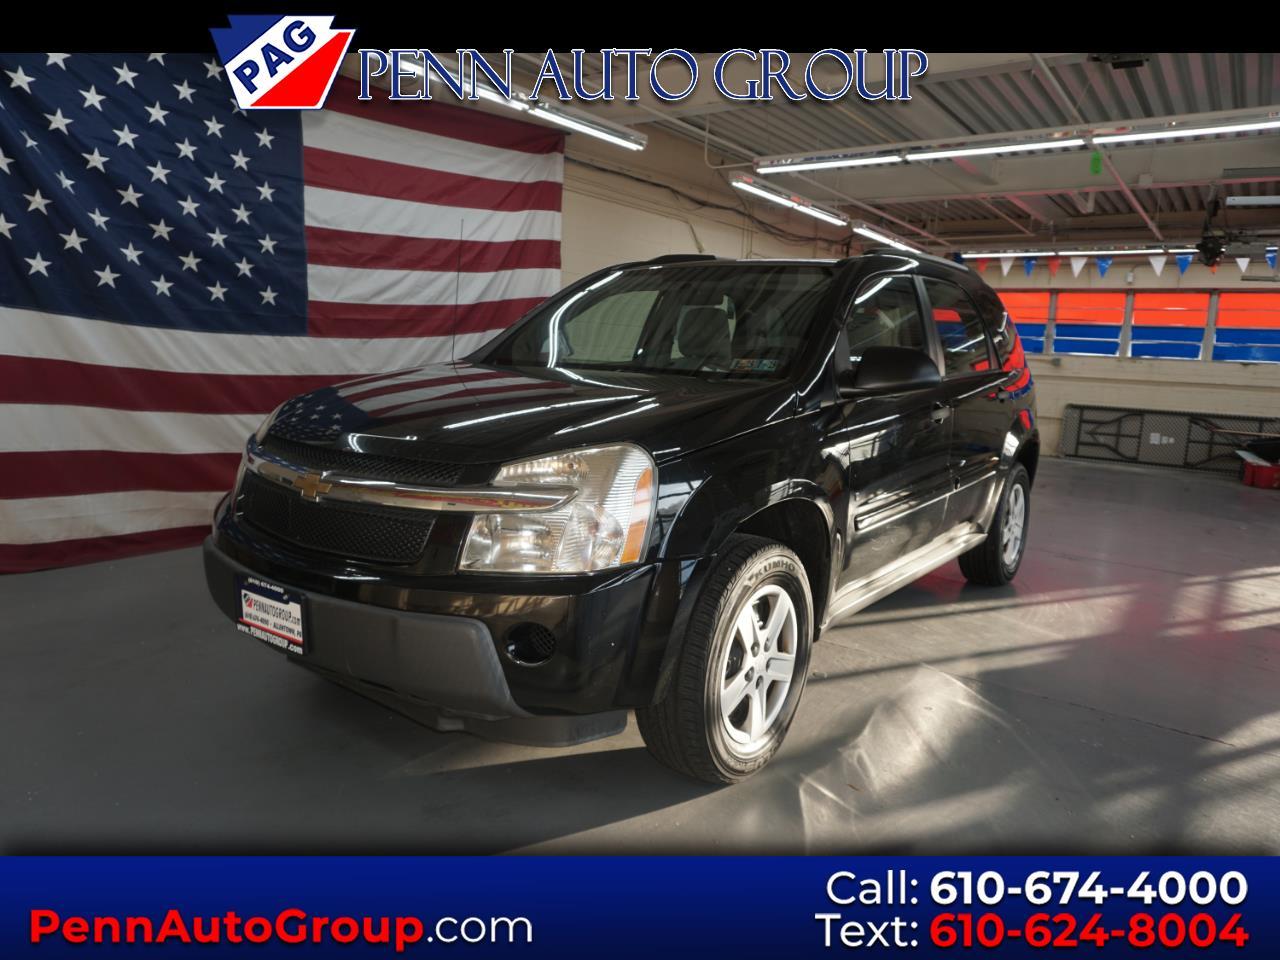 2006 Chevrolet Equinox 4dr AWD LS